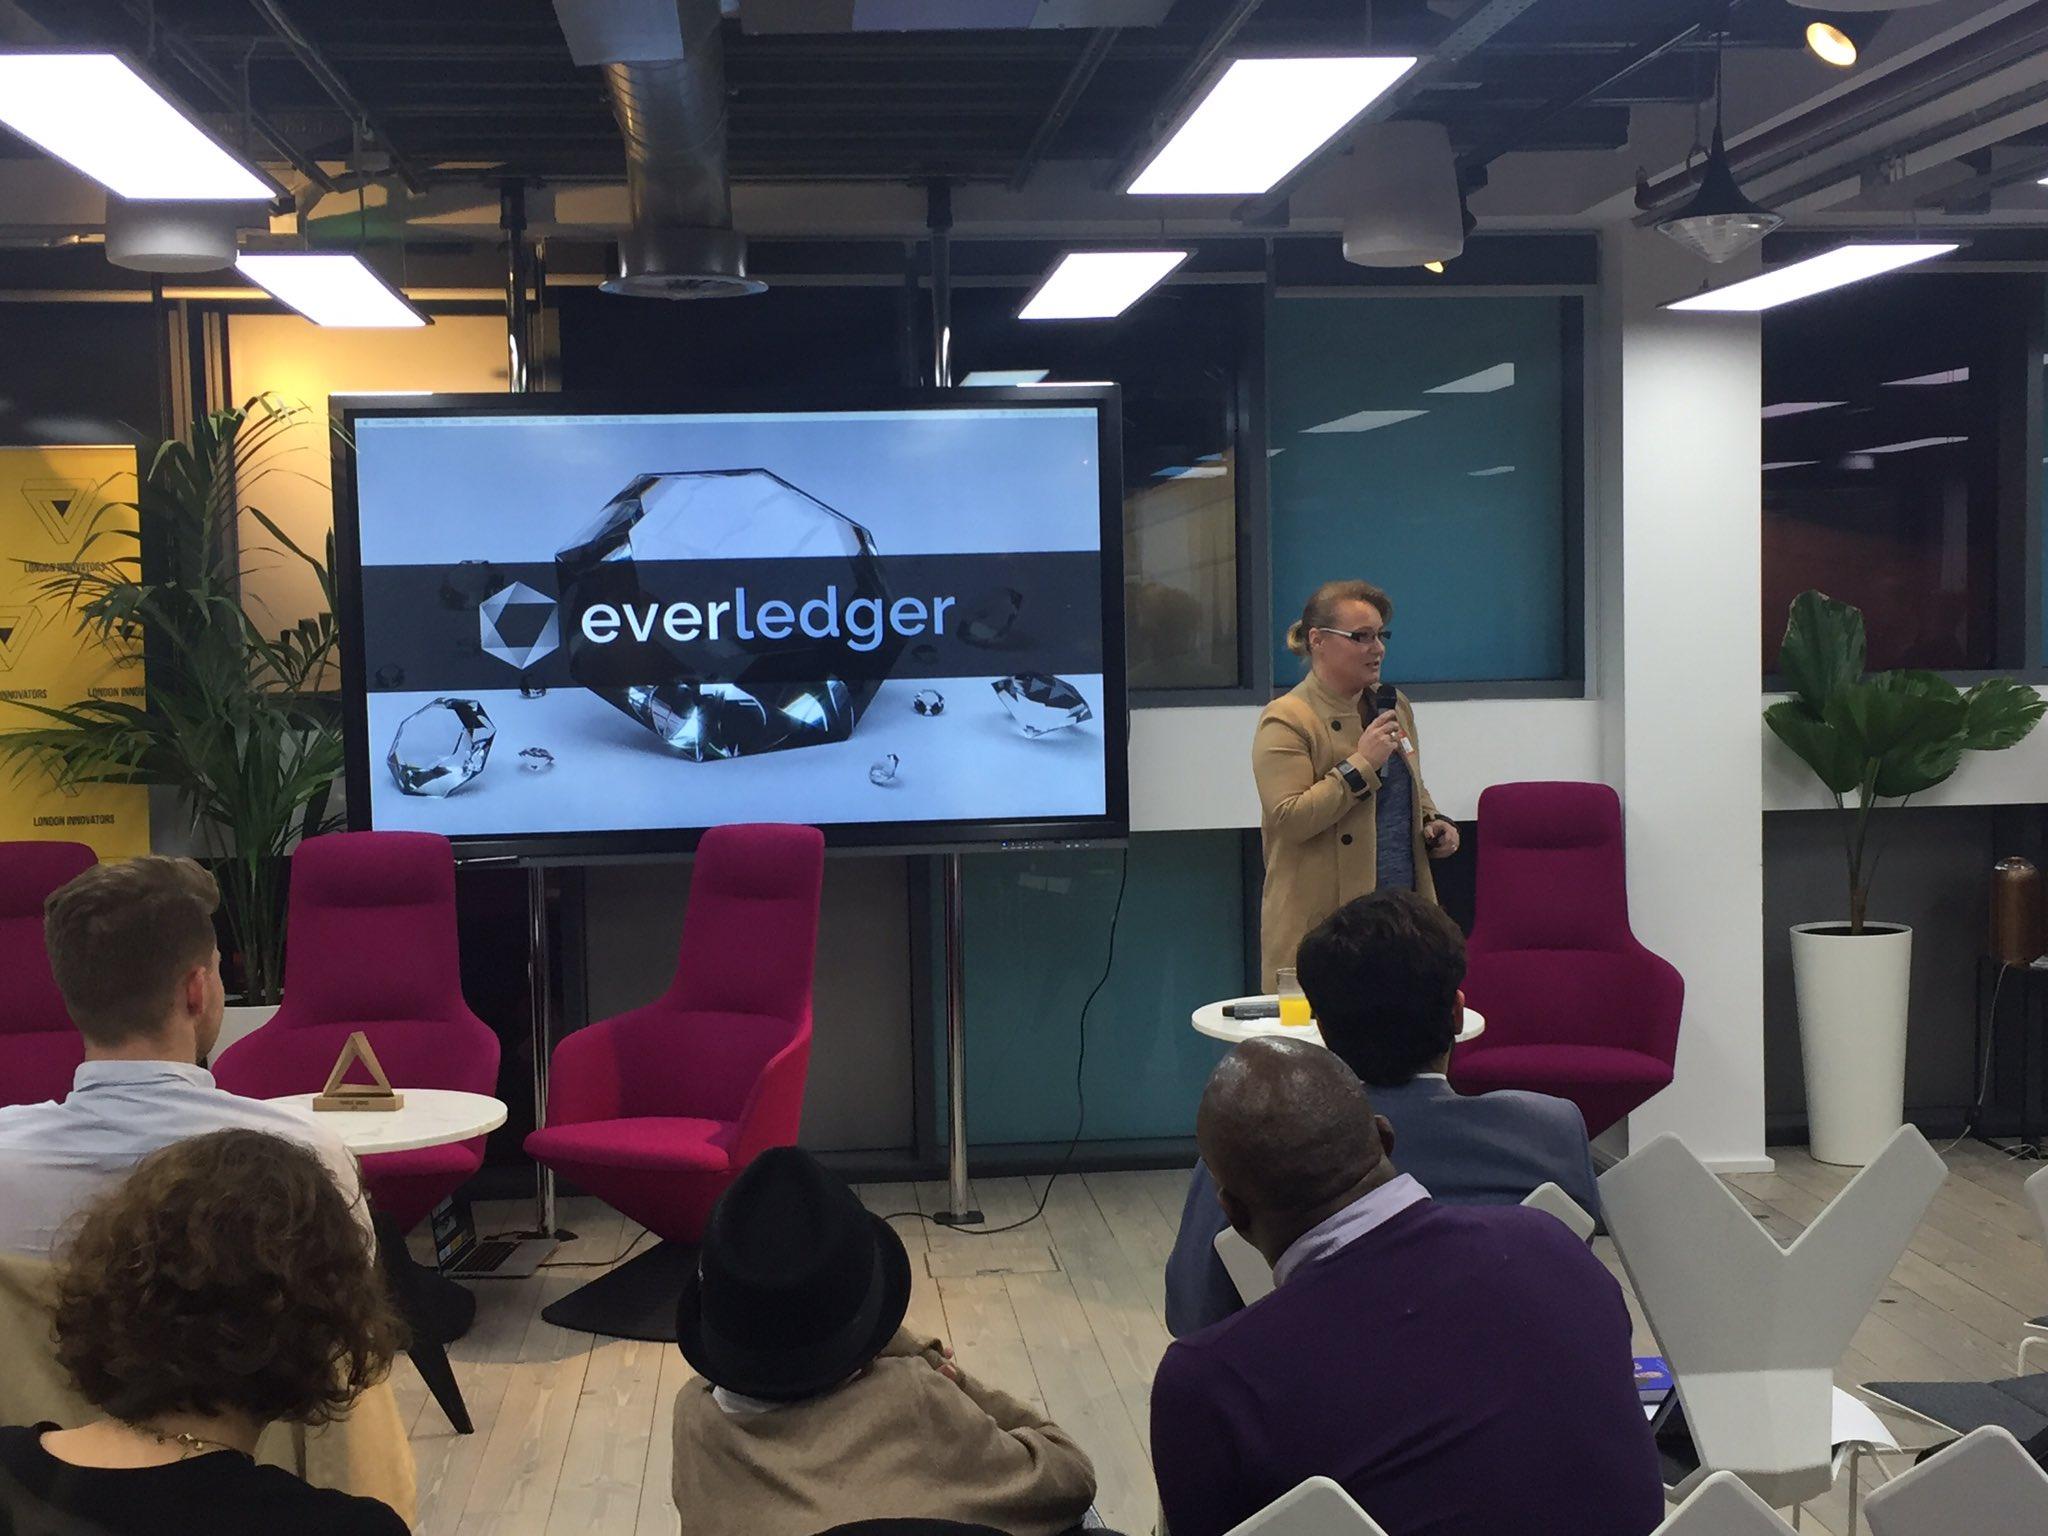 Blockchain tech @everledgerio wins Innovator of the Year at #penroseawards https://t.co/RmcjZVZVwm